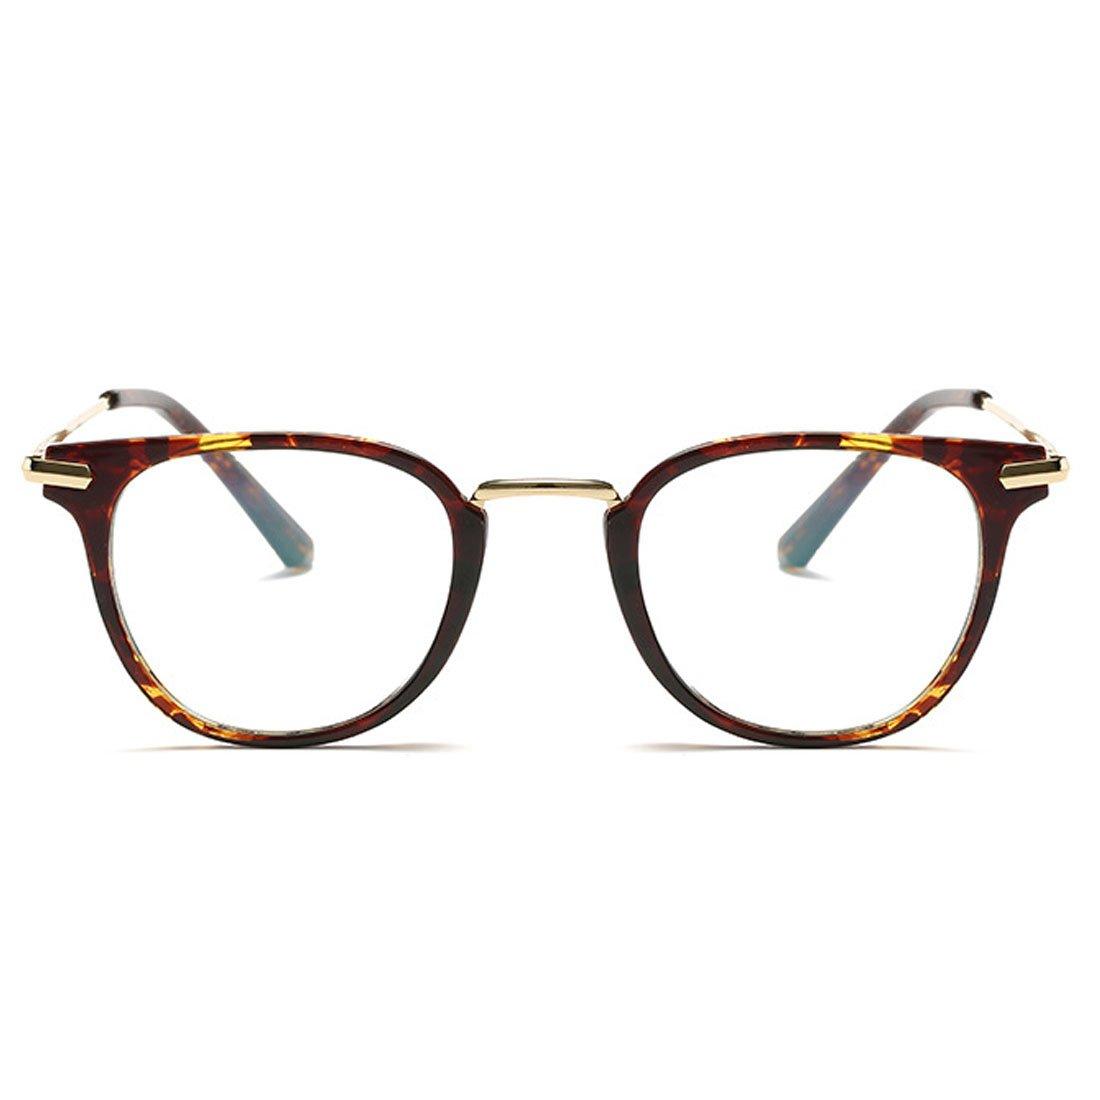 D.King Fashion Horn Rimmed Metal Temple Round Eyeglasses Frame Clear Lens Glasses